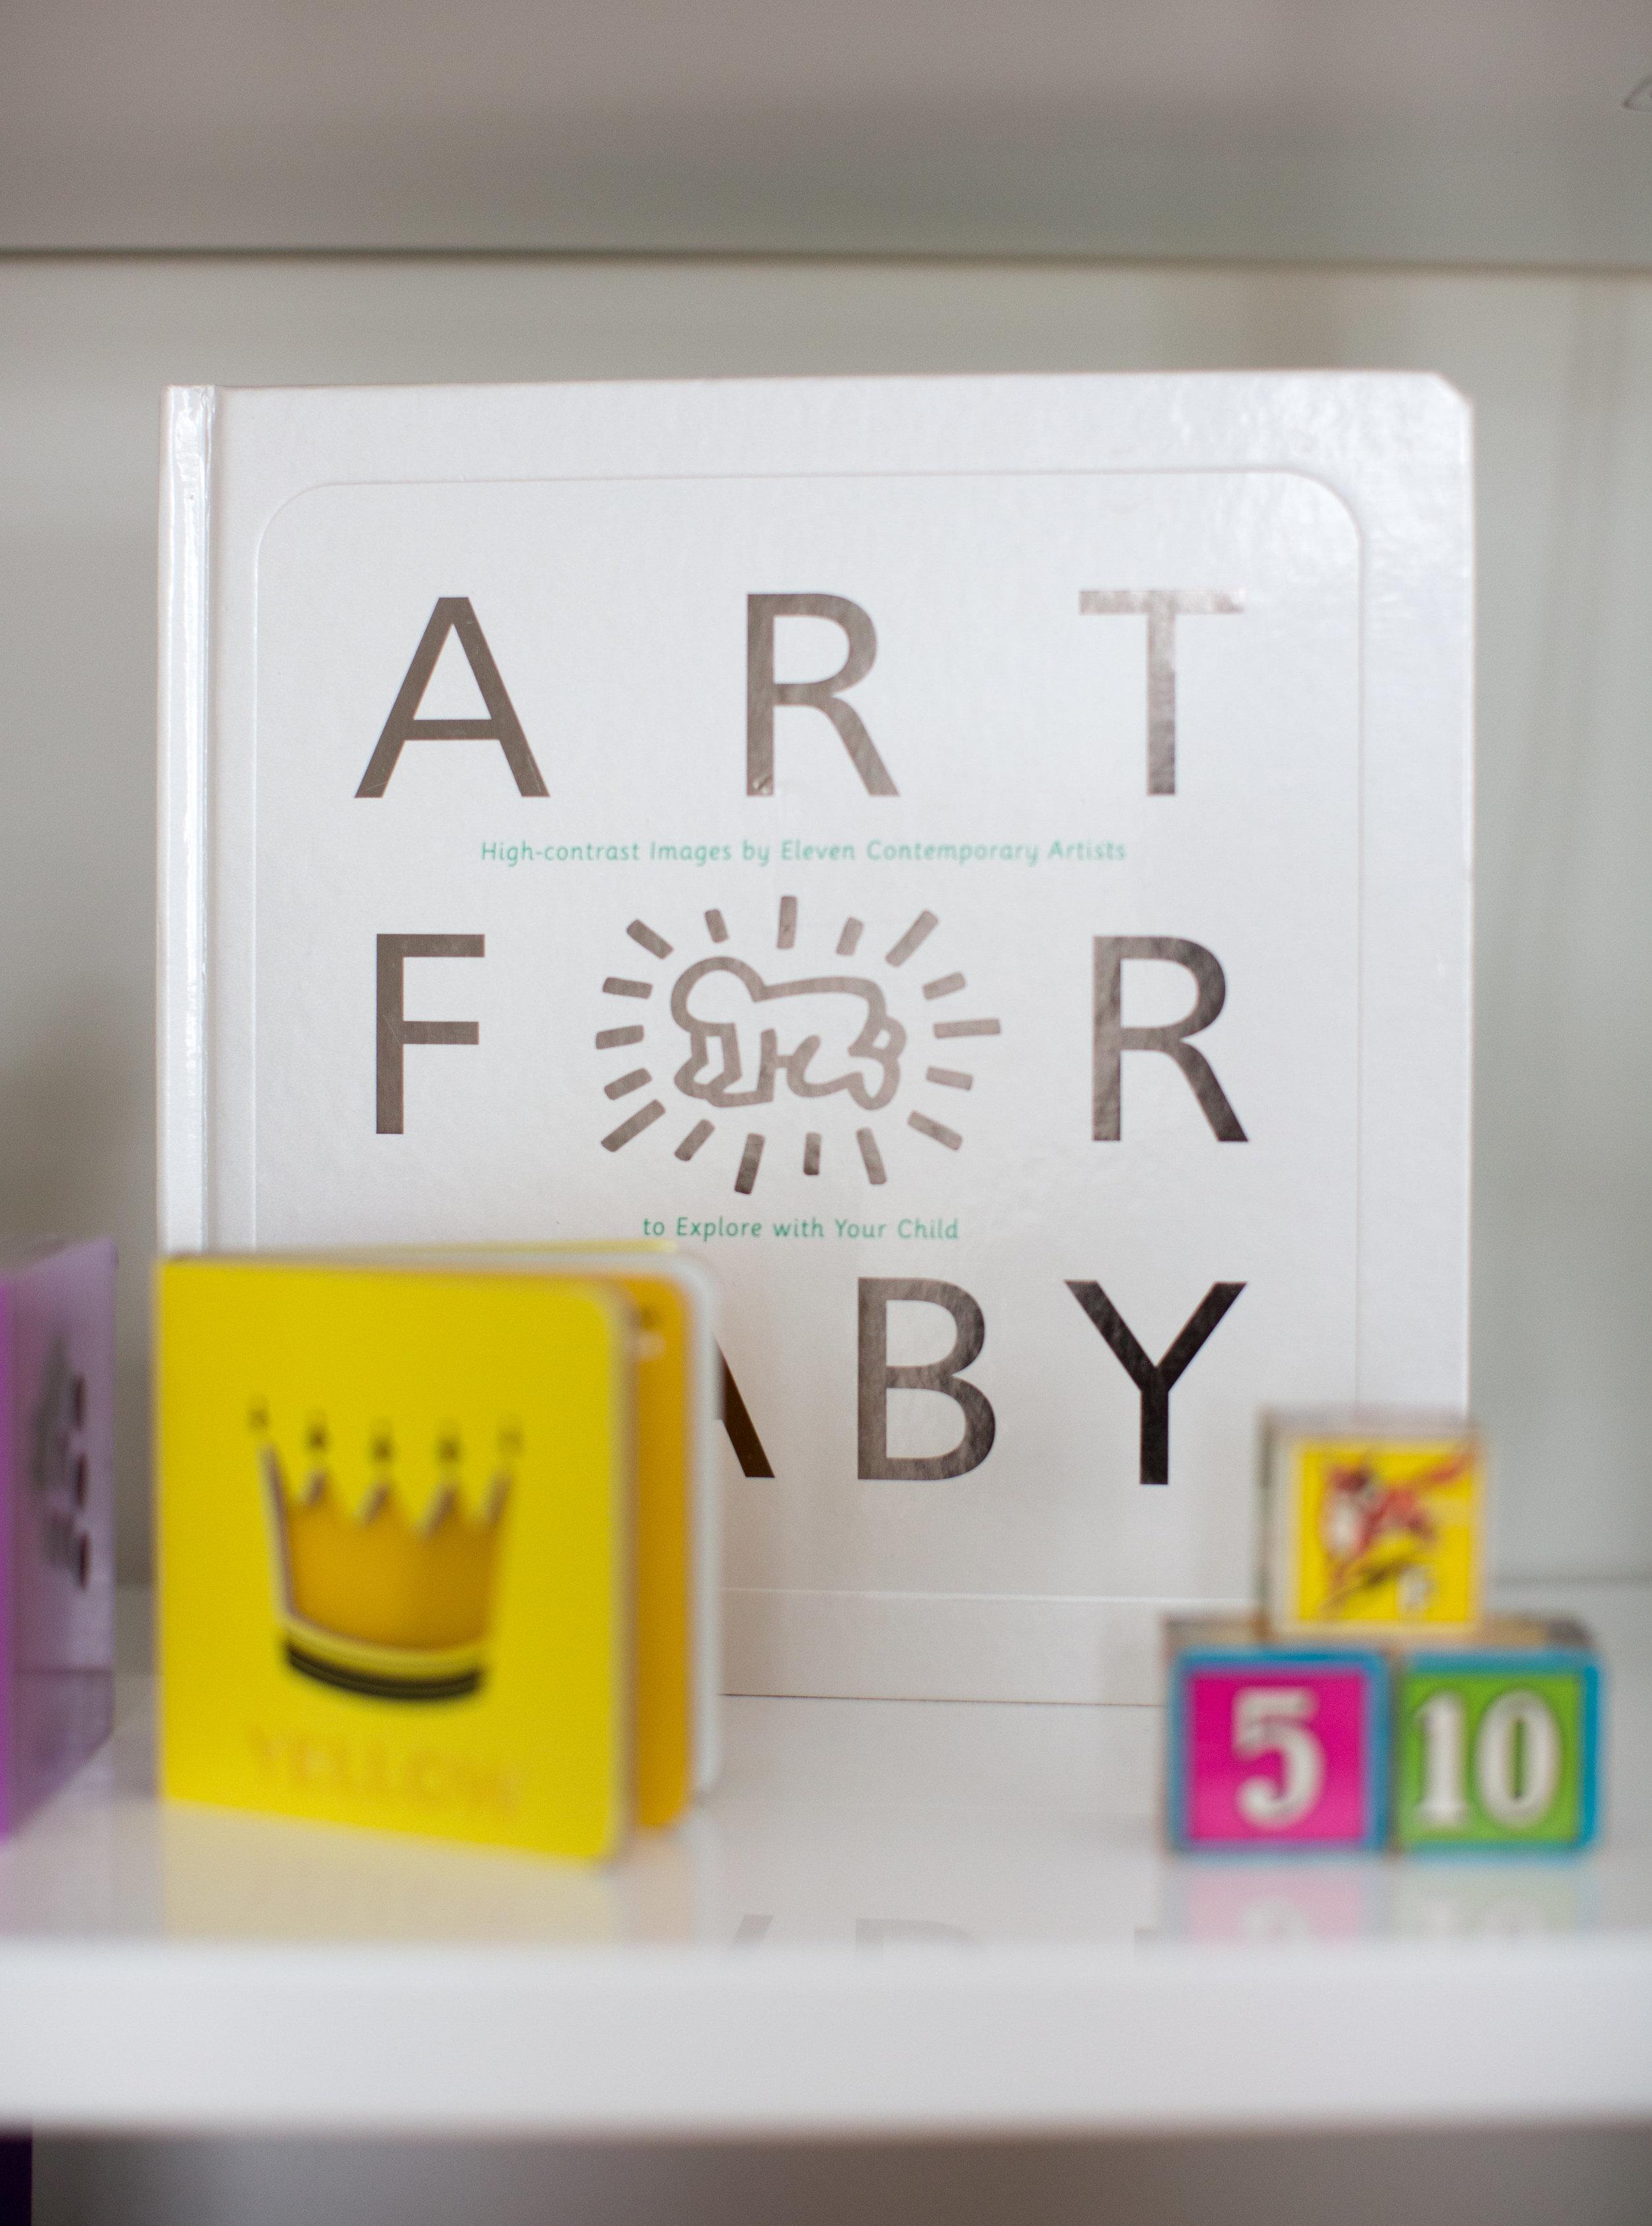 Ceci_Johnson_Welcome_Baby_Elle_Hazel_Johnson_Nursery_Tour_Design_Baby_Product_Pick_kid_Ana_Schechter_newborn_photography_34.jpg